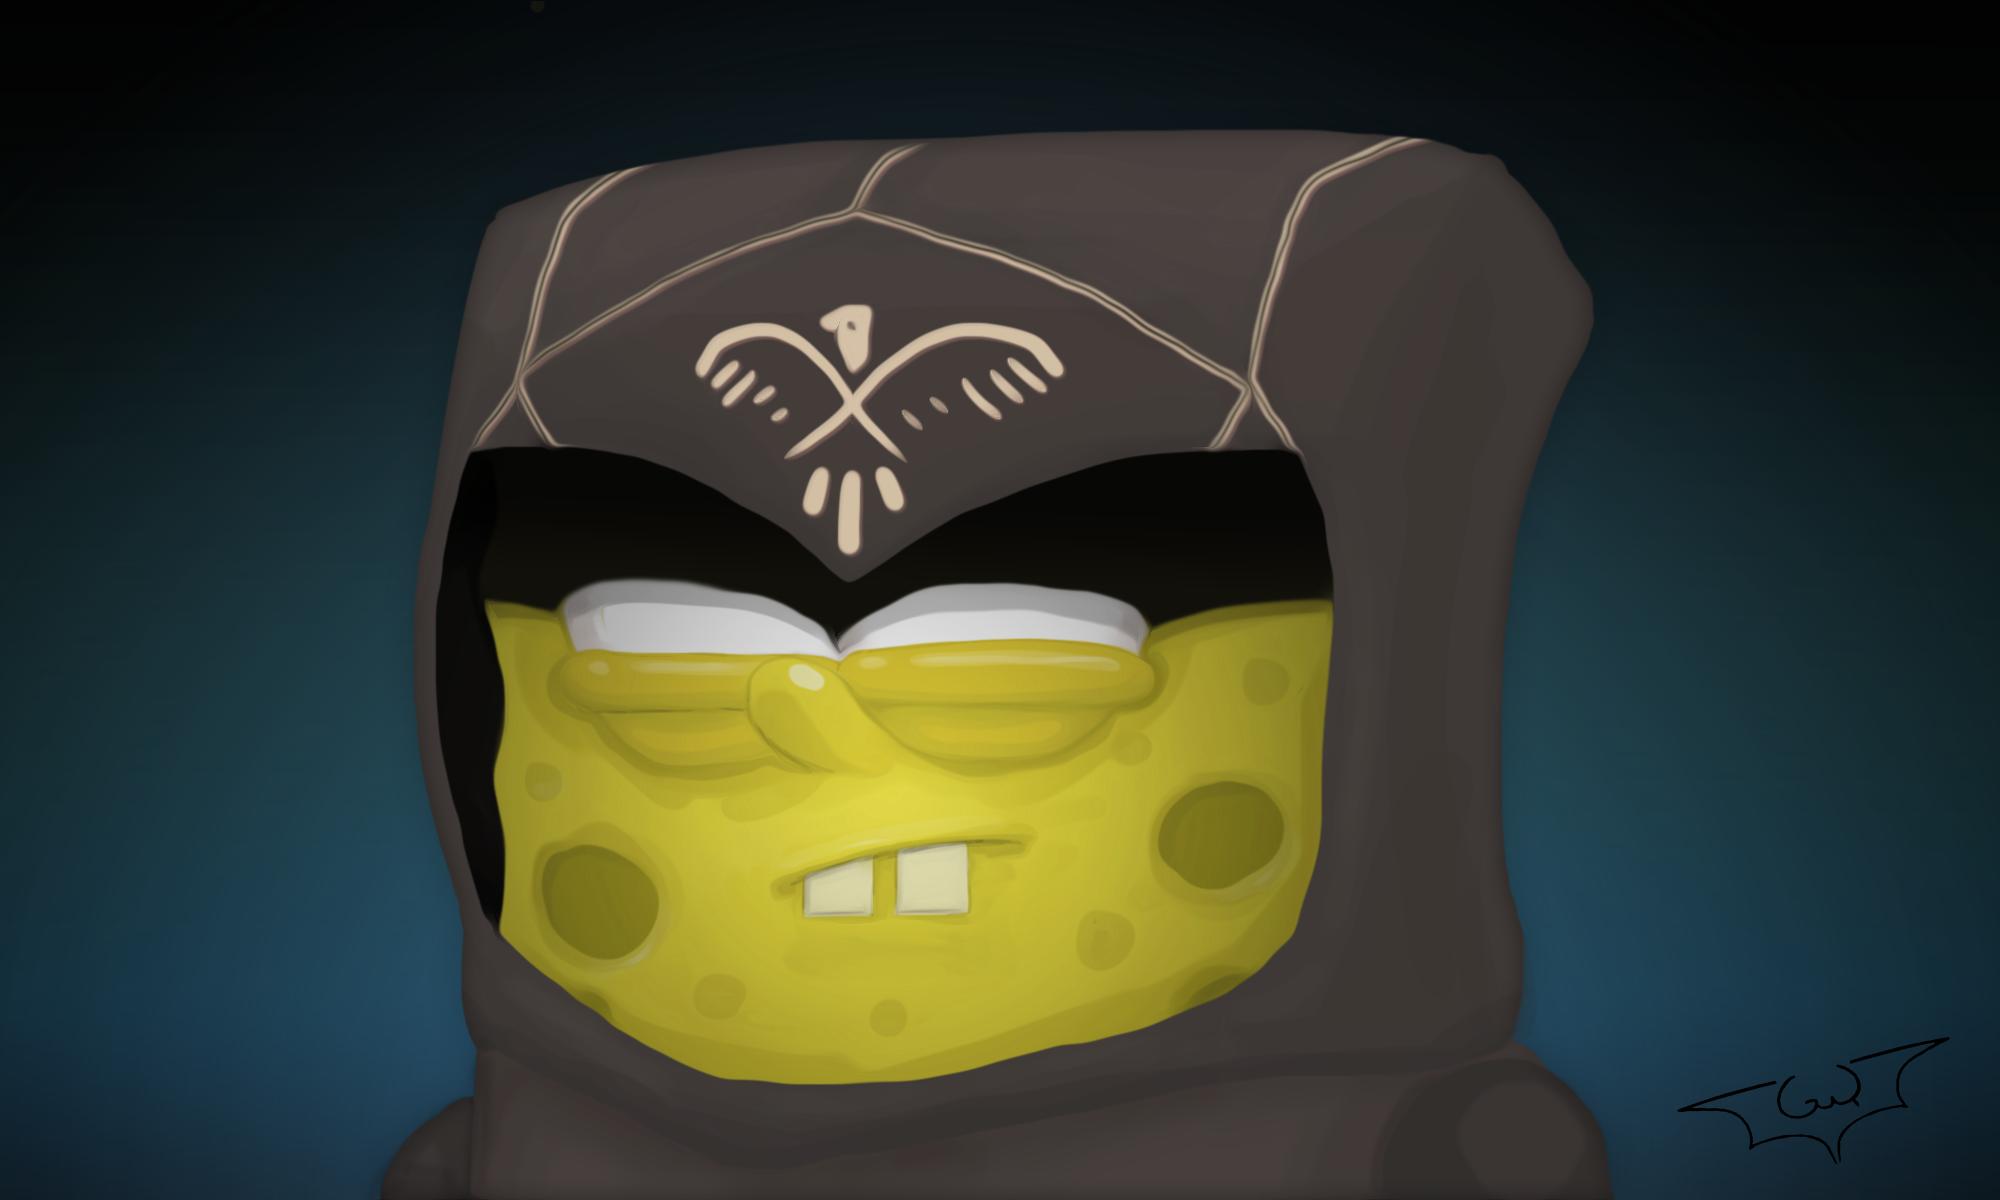 Spongecreed